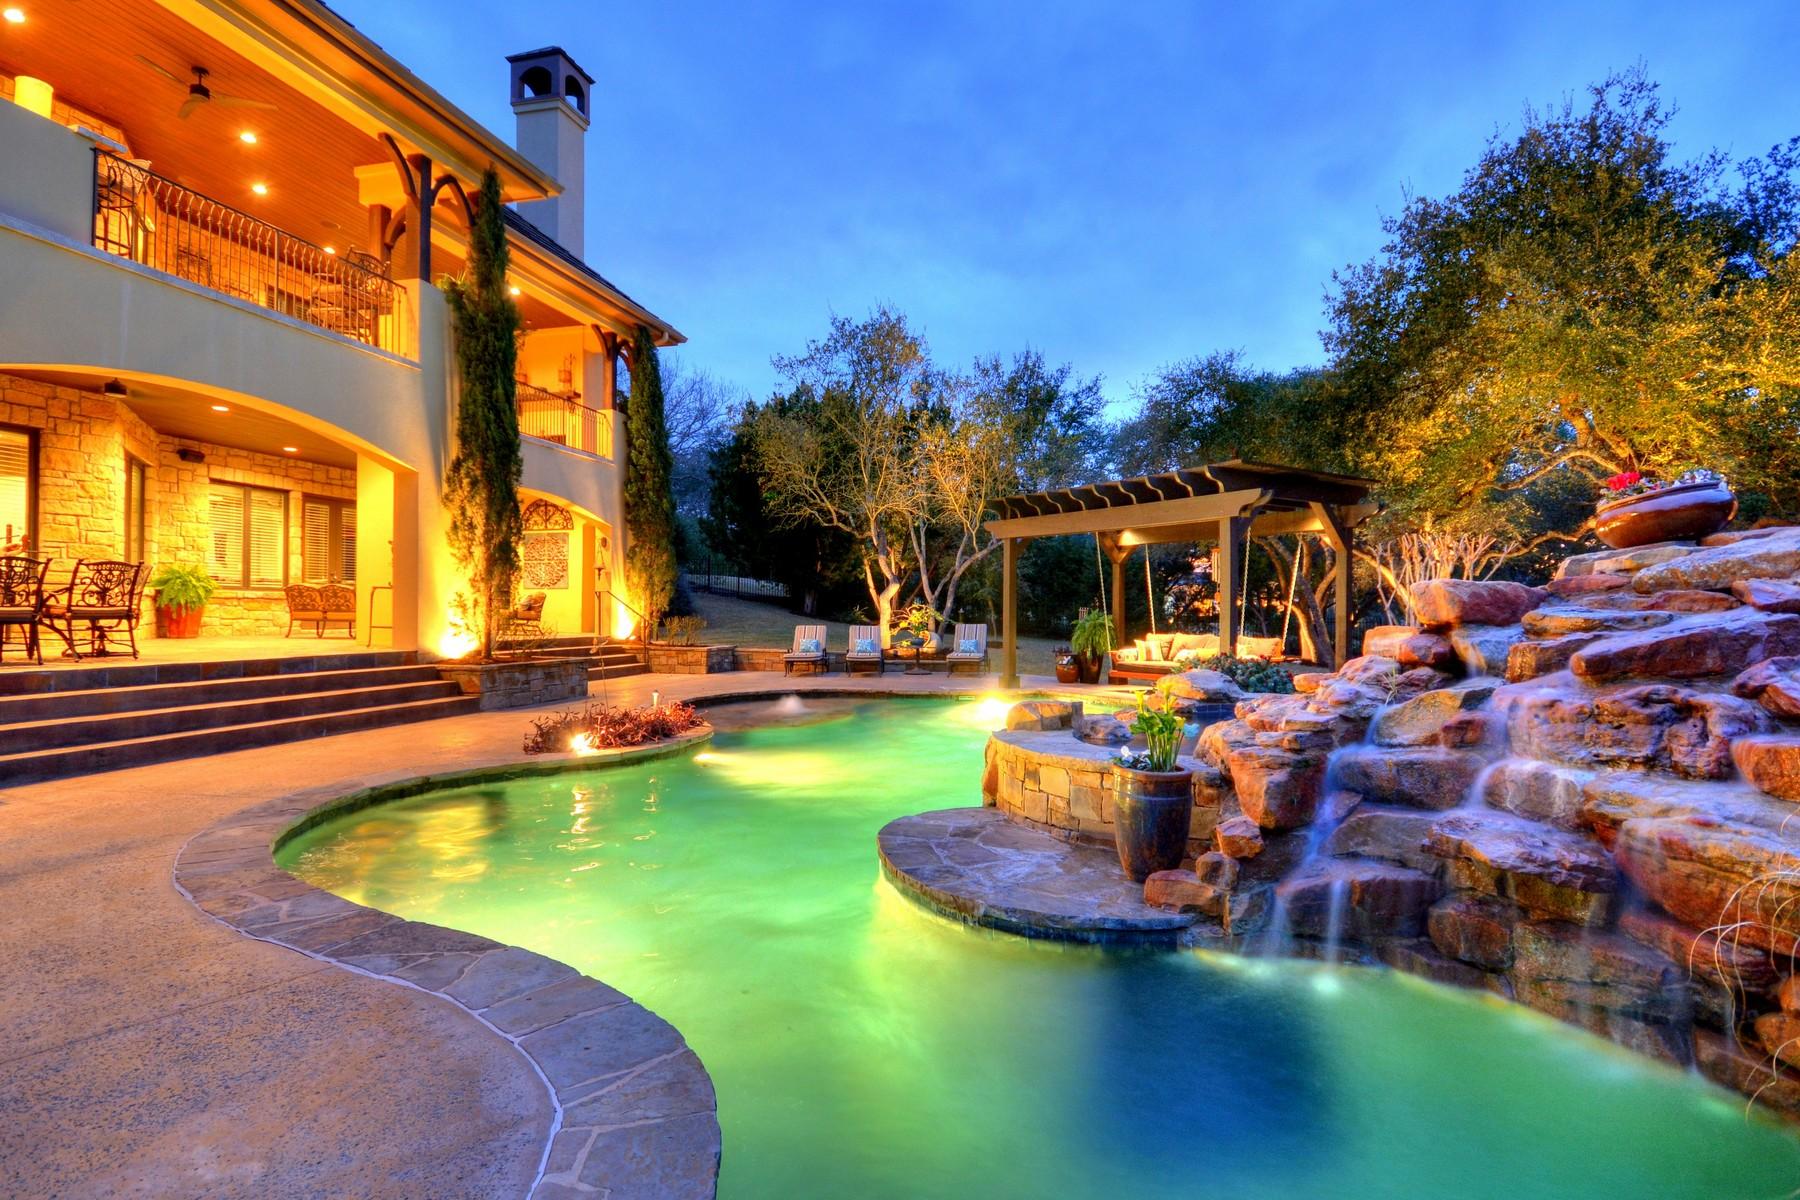 Casa Unifamiliar por un Venta en Lake Travis Living at its Best 15900 Fontaine Ave Austin, Texas 78734 Estados Unidos